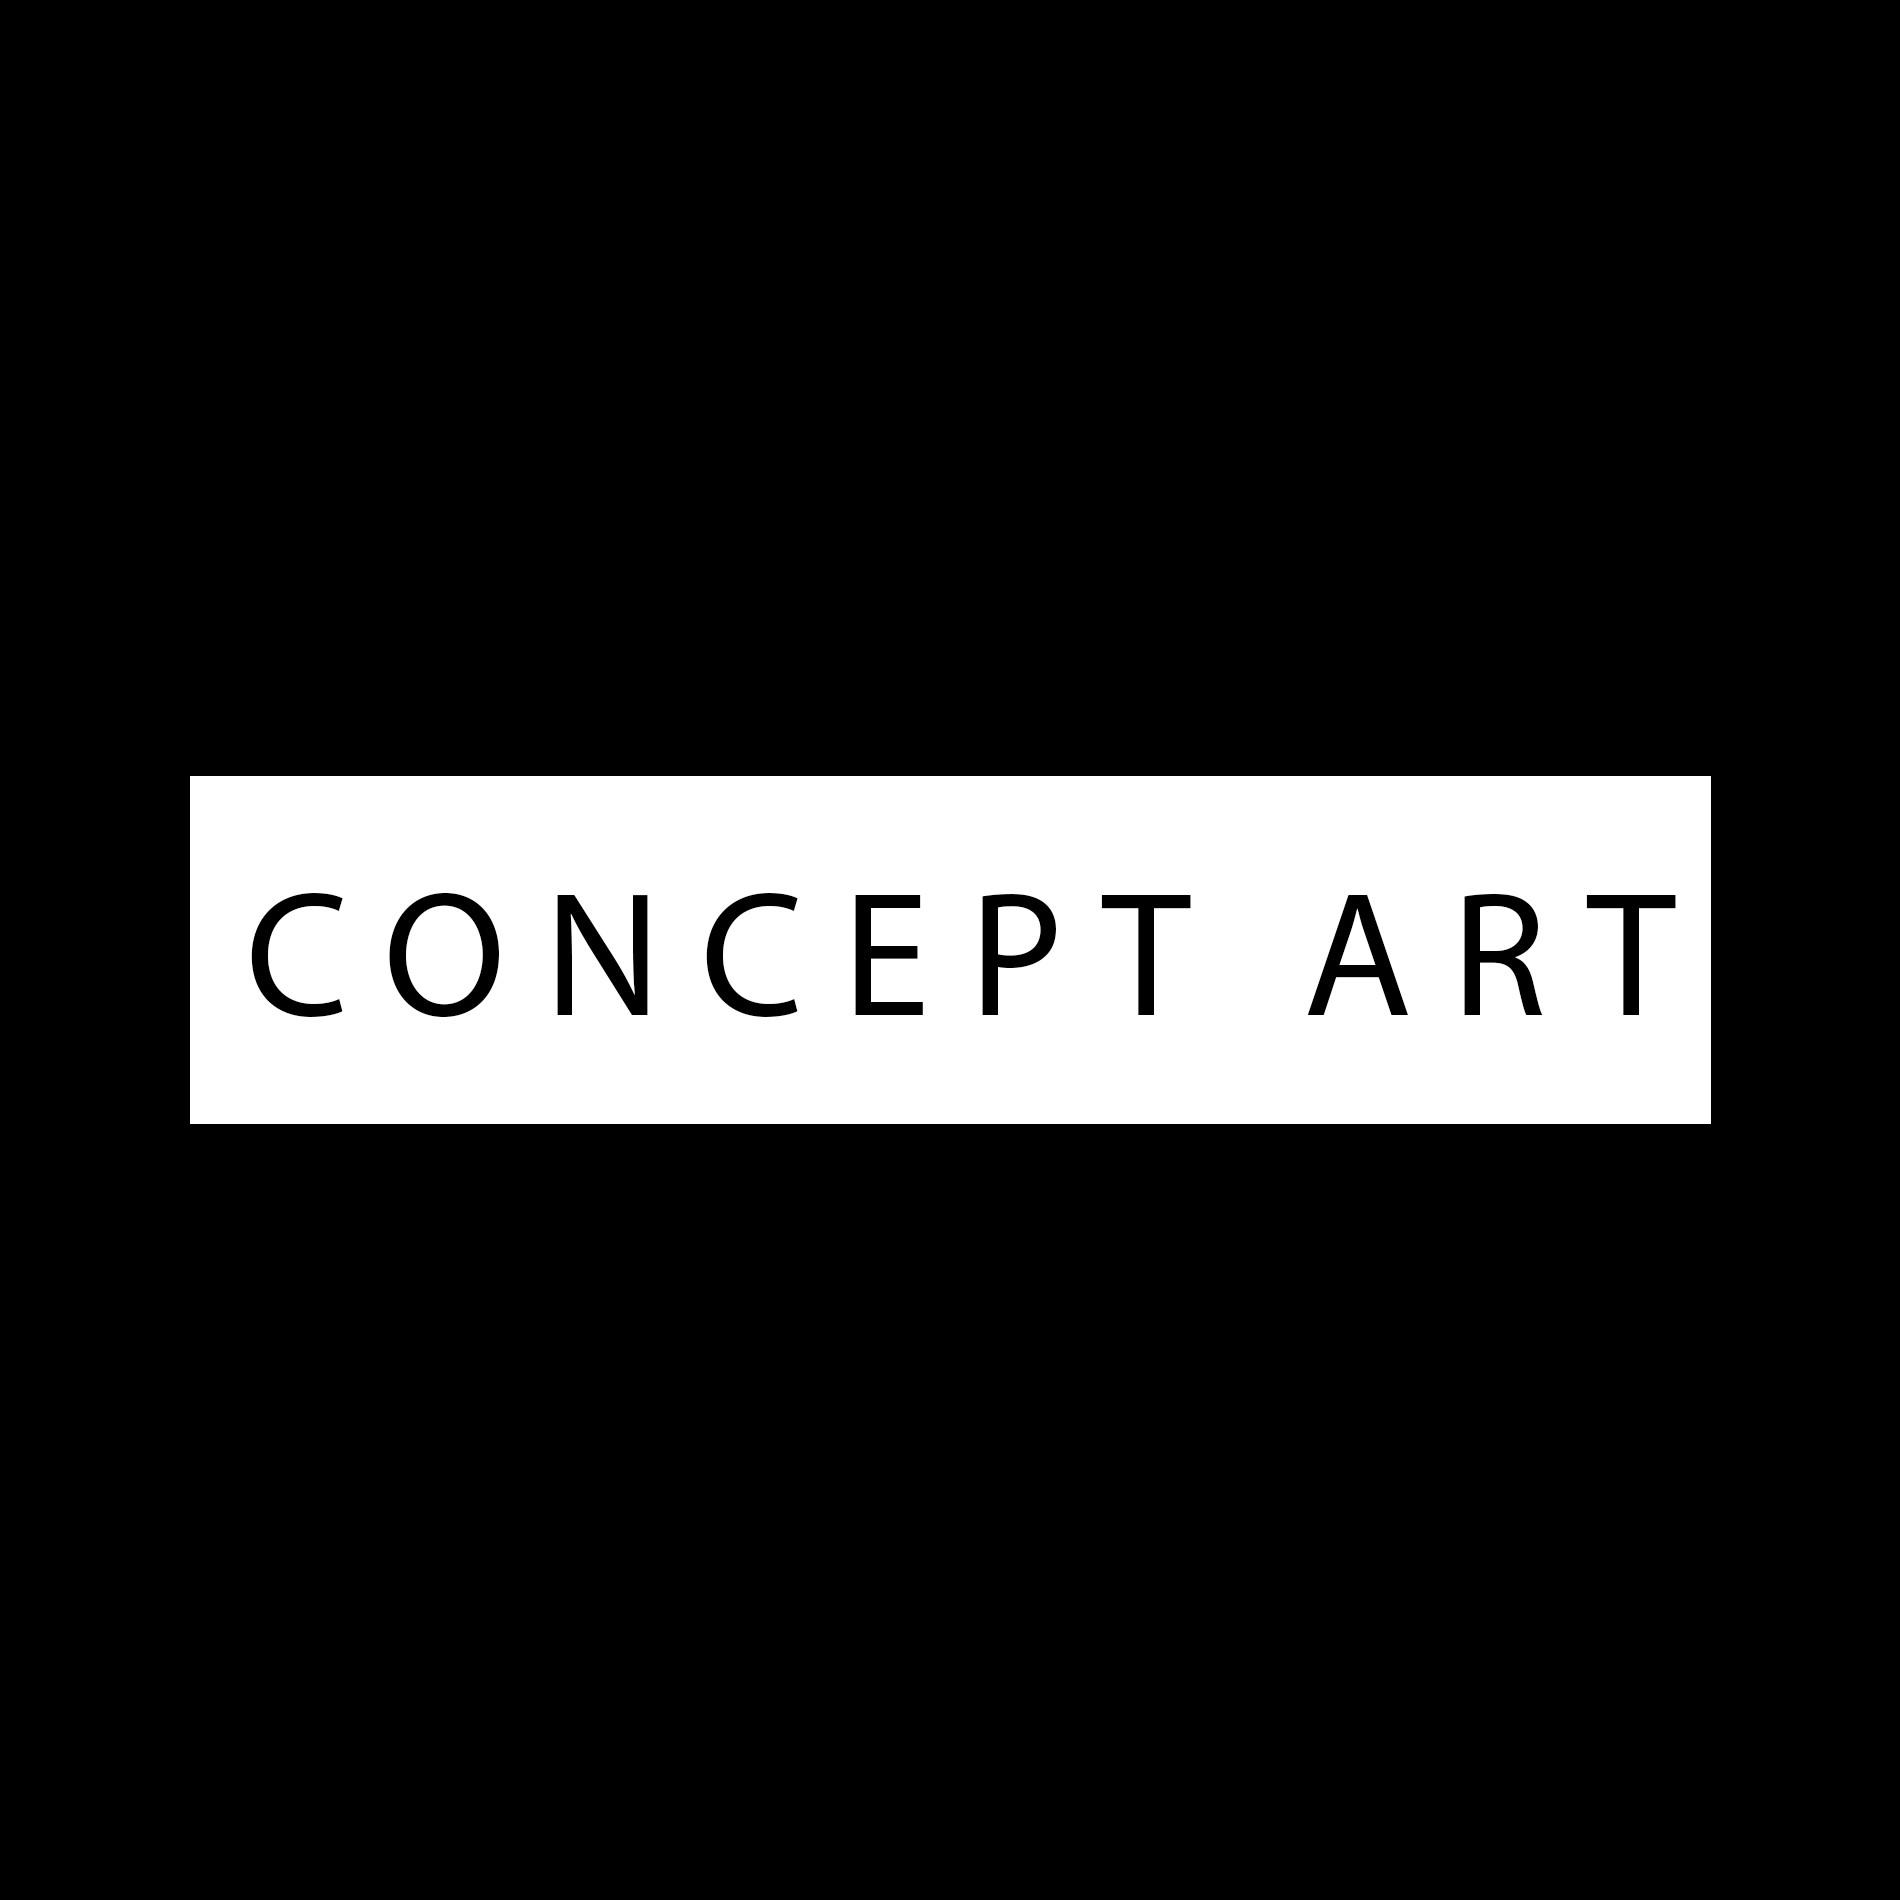 Fabricio rezende conmcept art